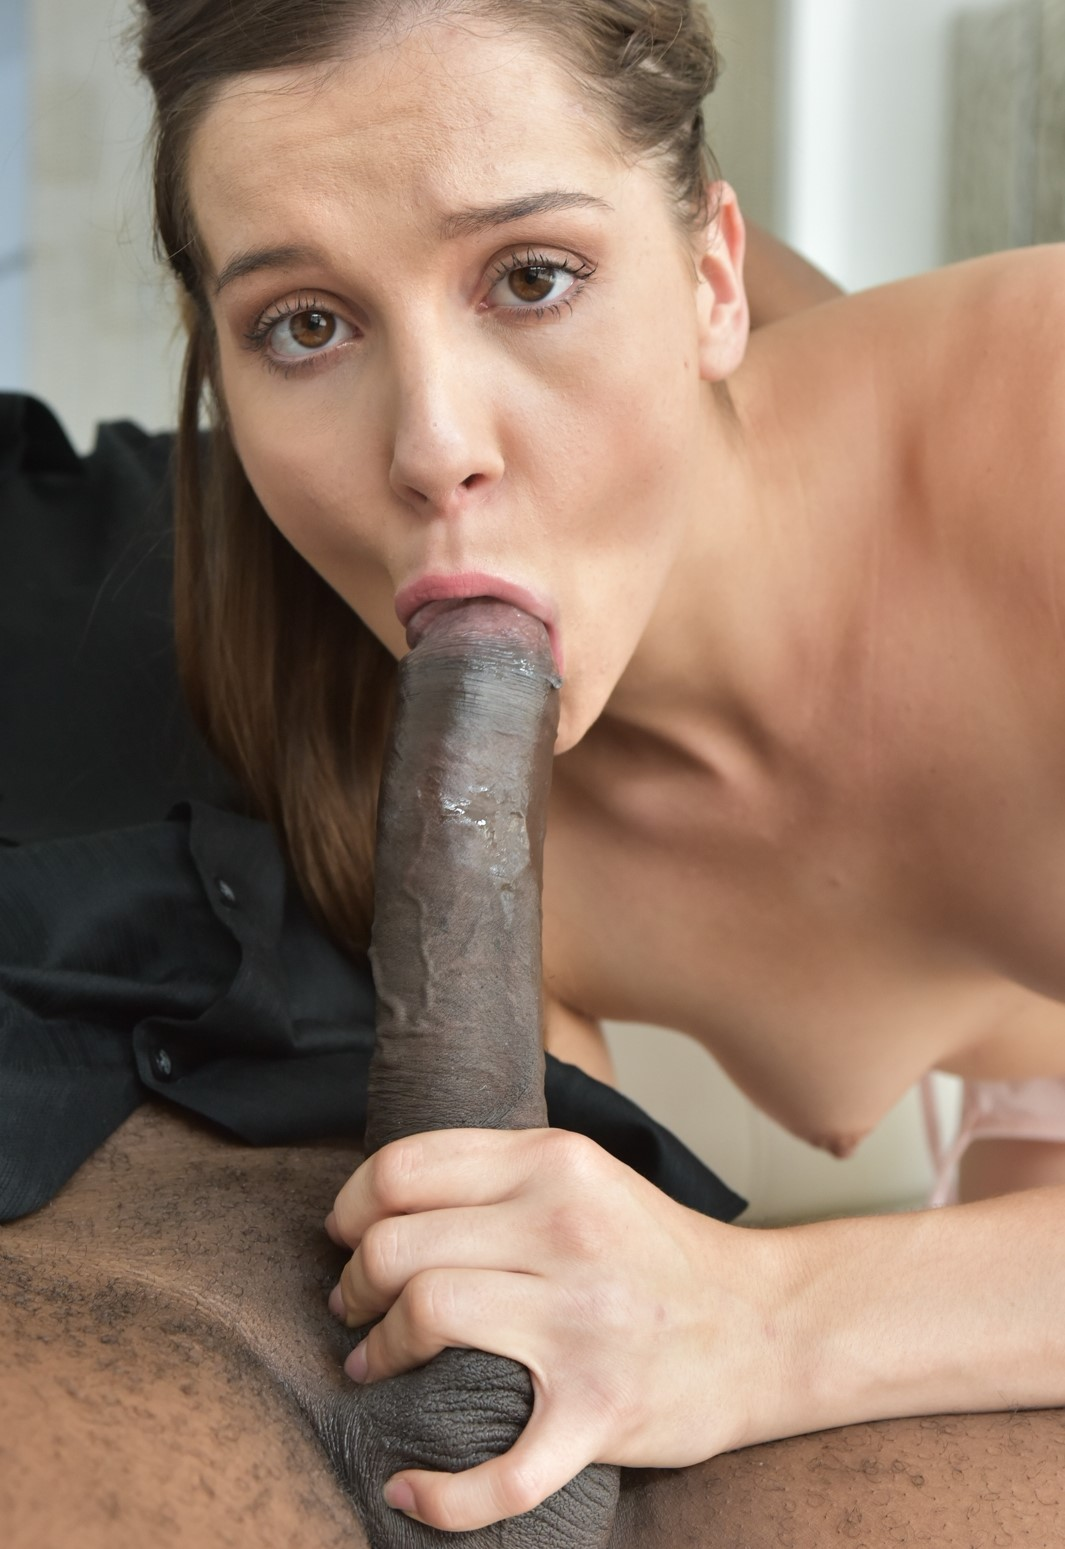 Kasey Warner - una putita linda disfruta de una verga negra